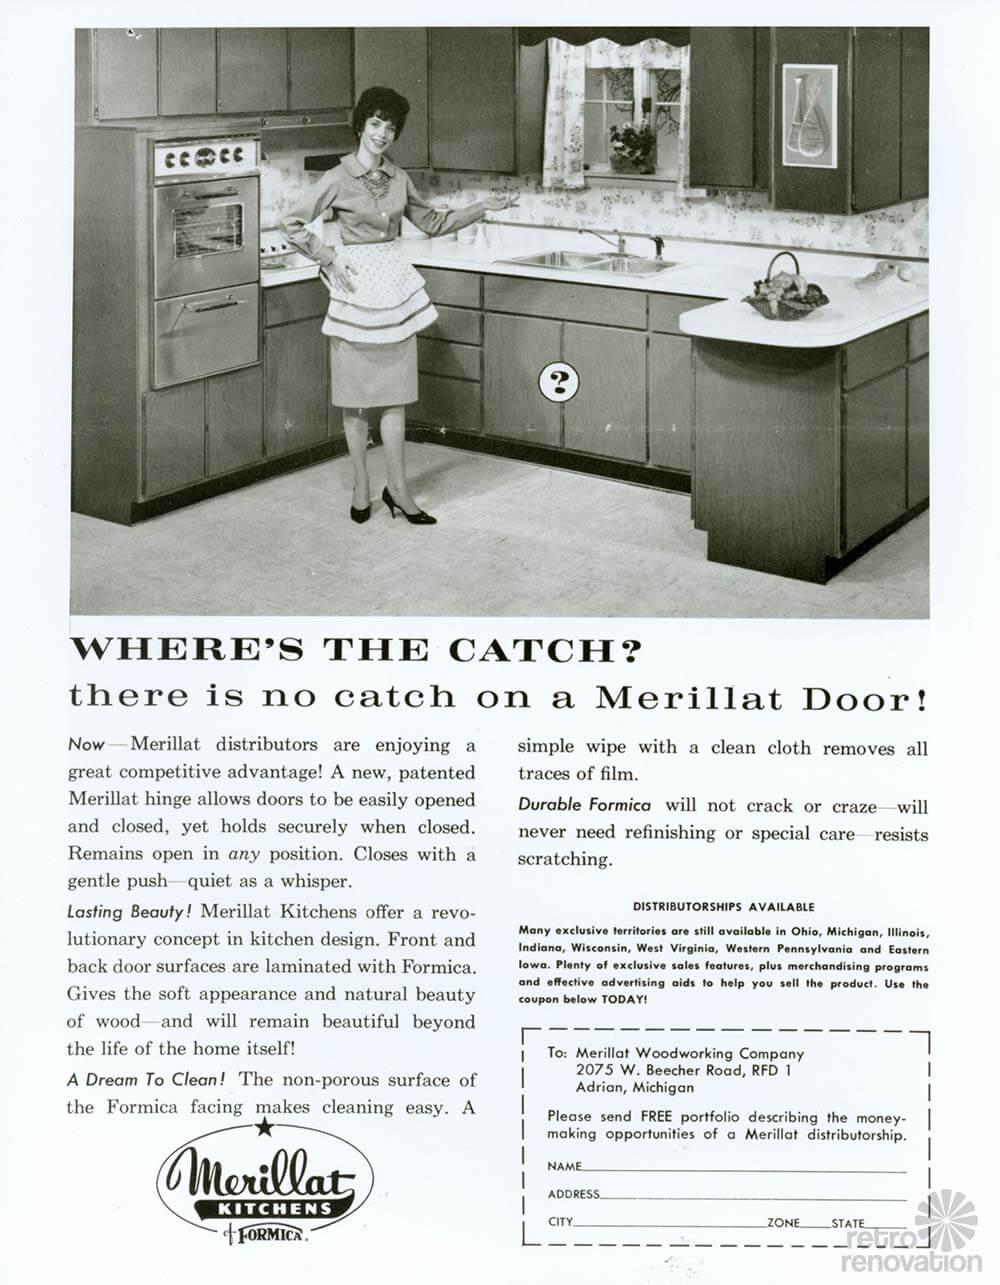 1946 Merillat Kitchen On Display At 2014 Kitchen And Bath Industry Show Kbis